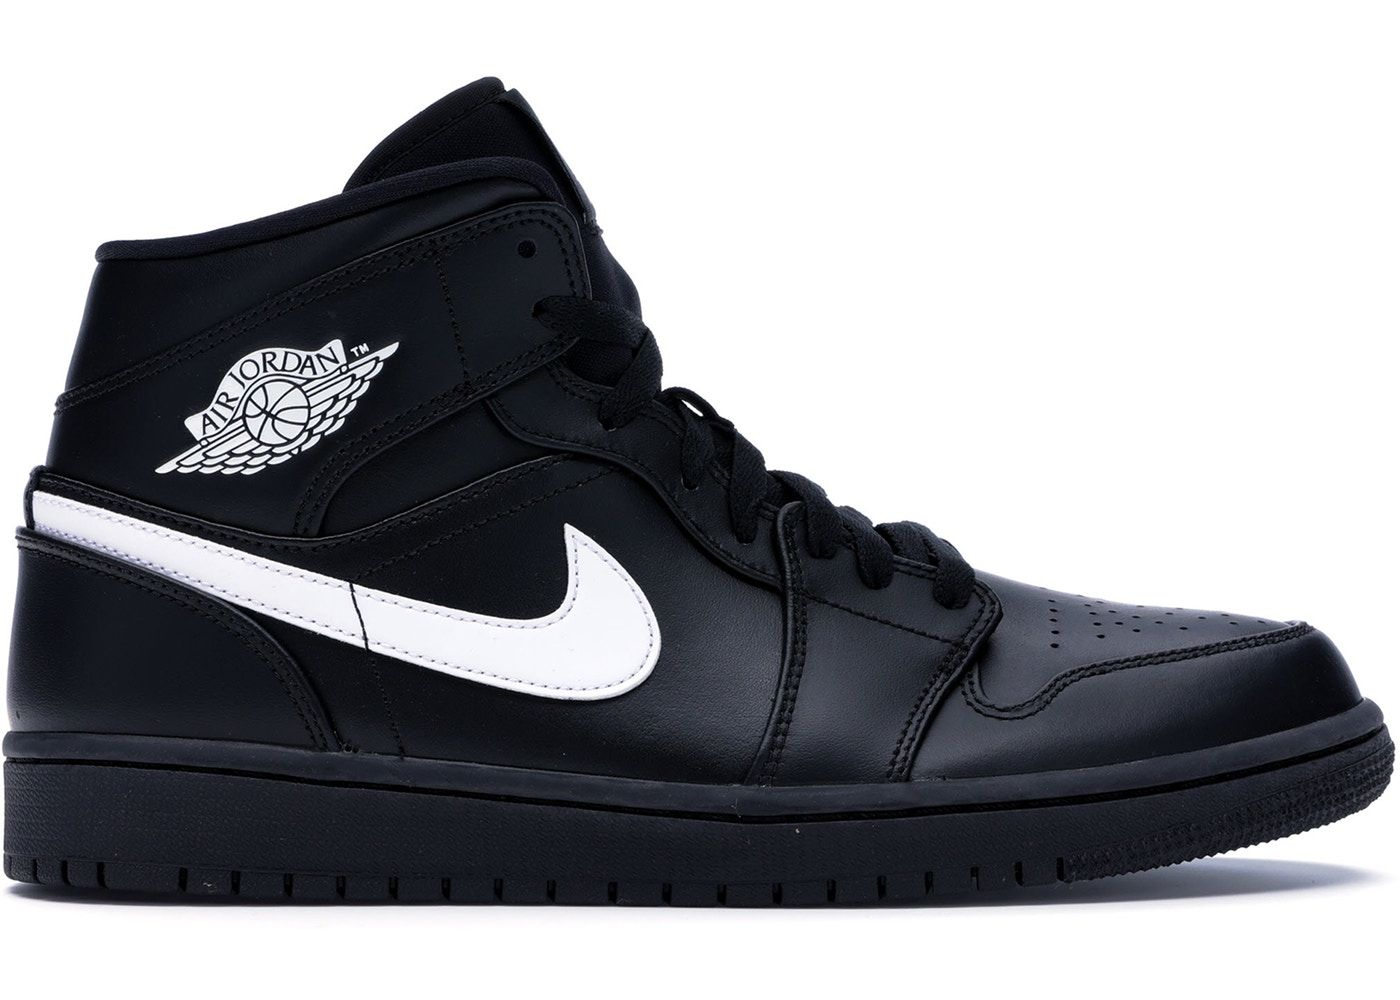 Jordan 1 Mid Black White (2018) in 2020 Jordan 1 mid